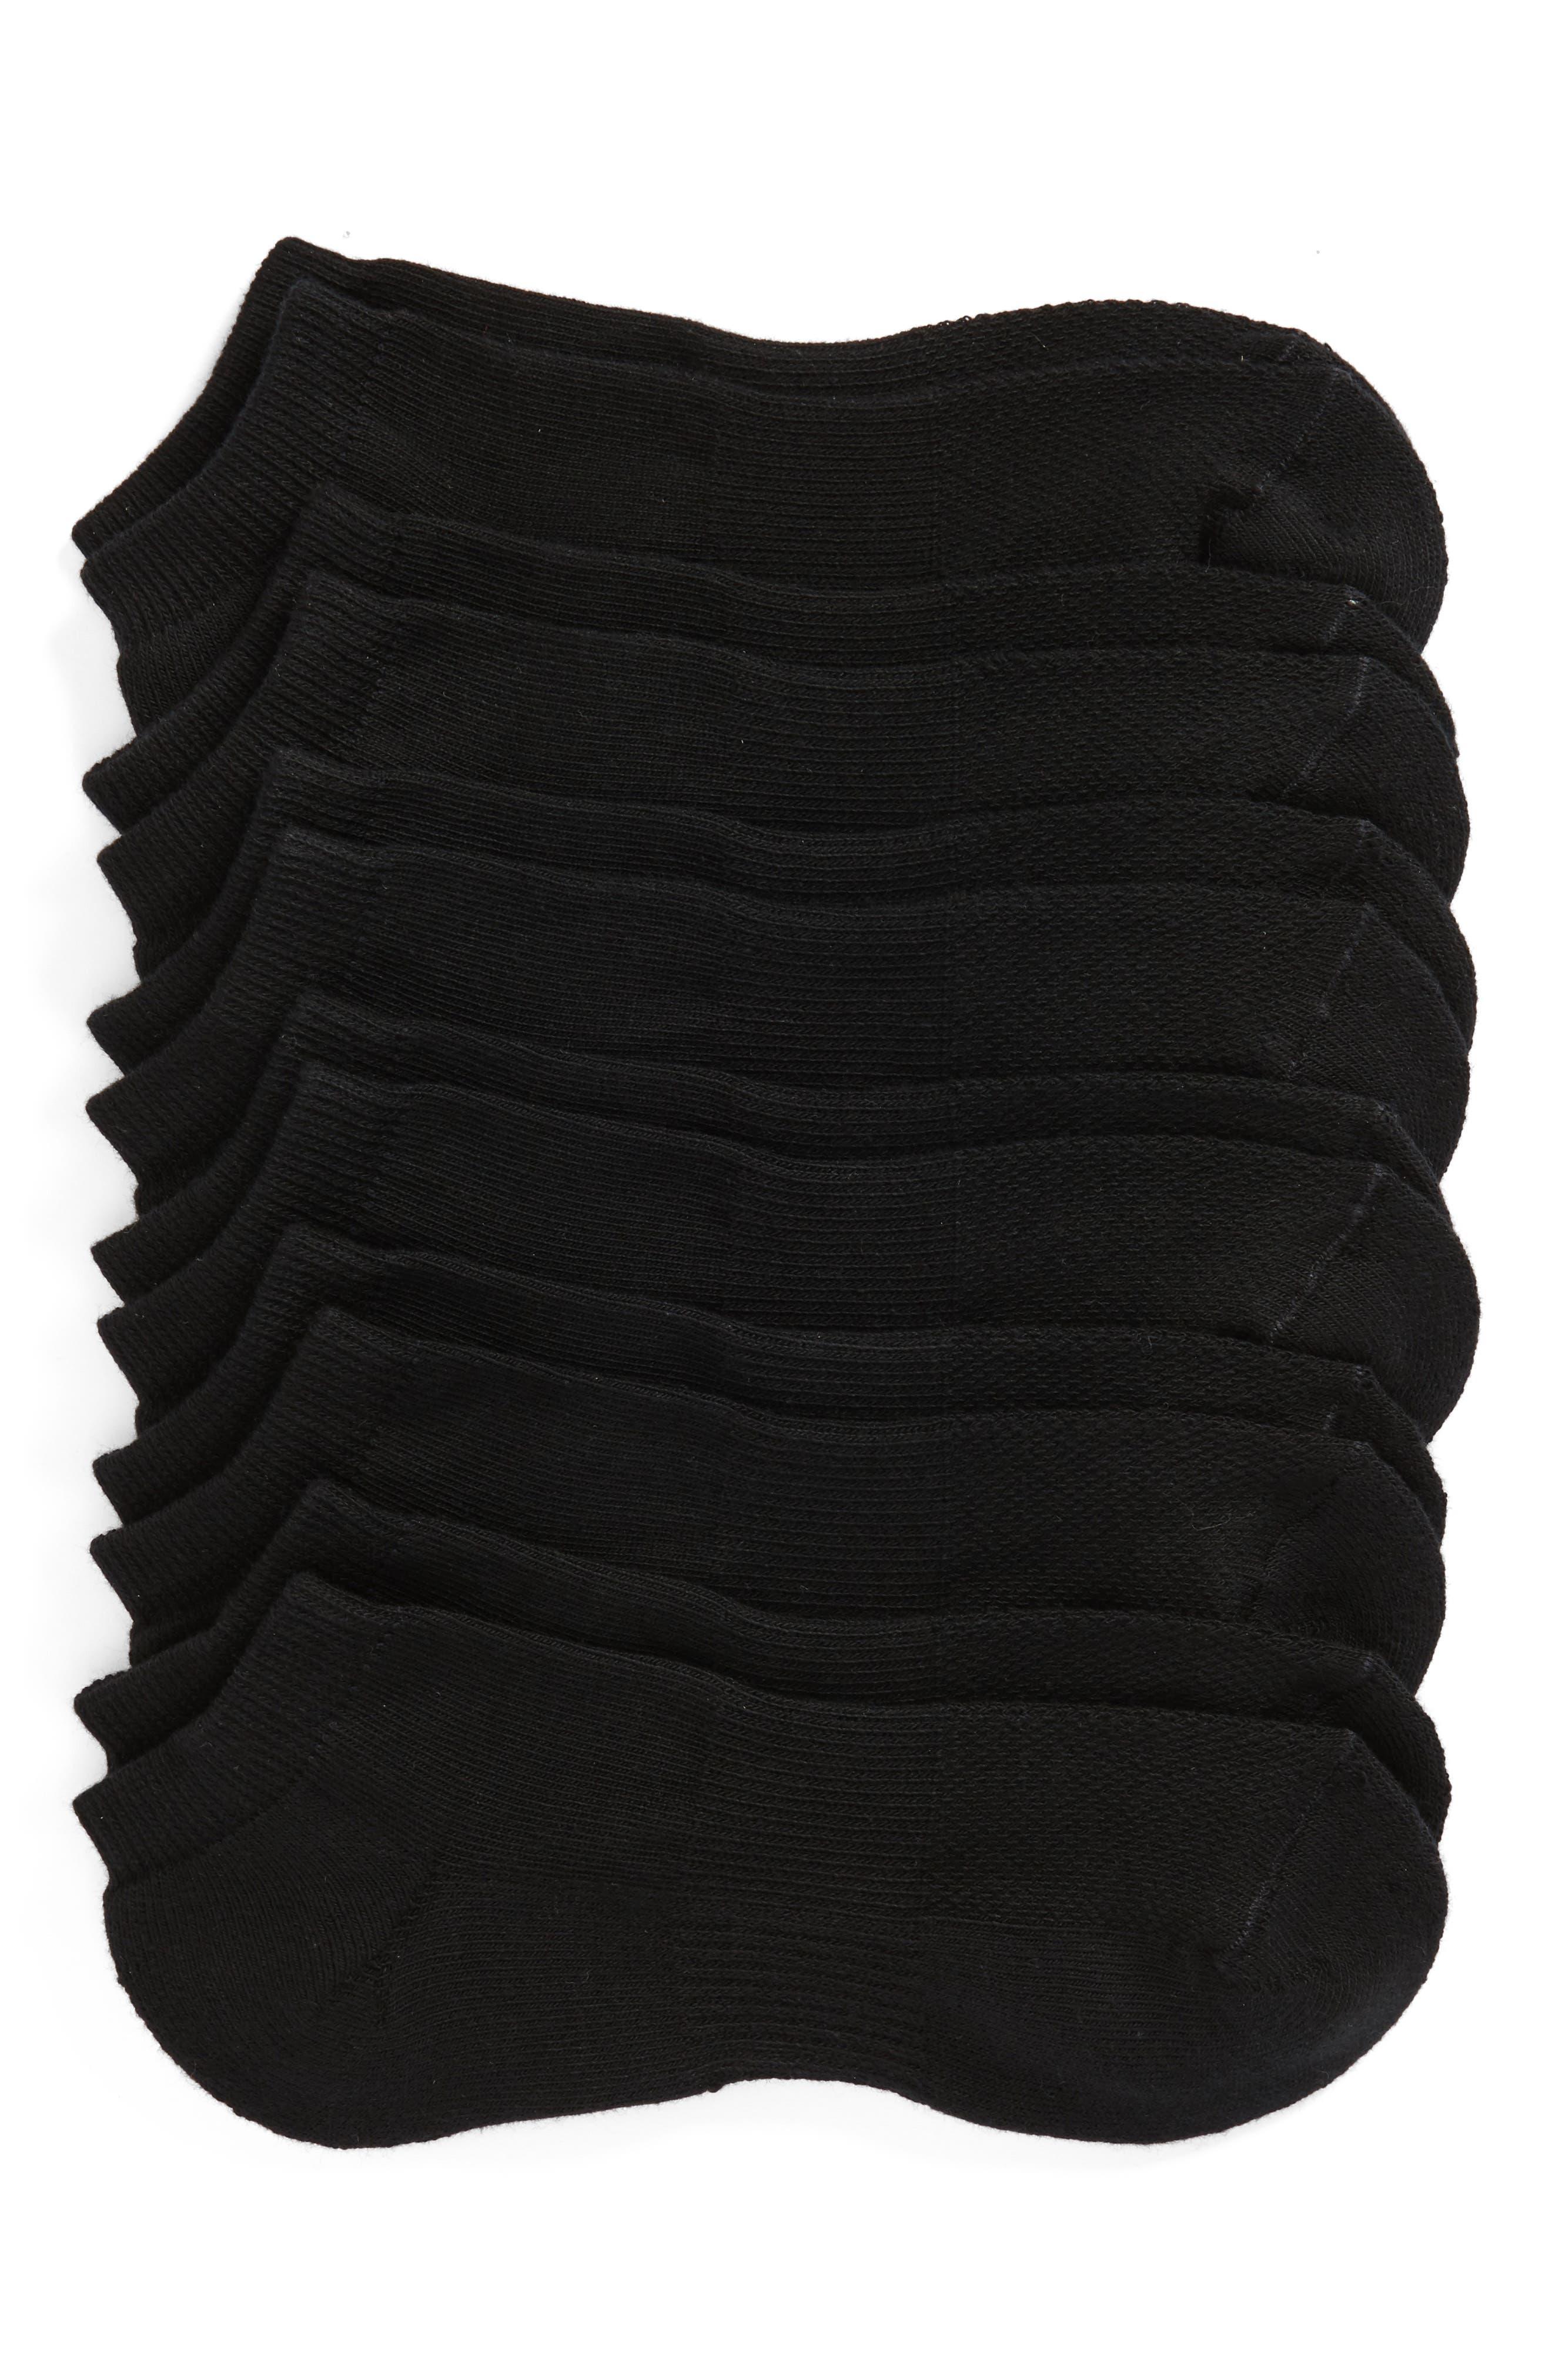 6-Pack Athletic No-Show Socks,                         Main,                         color, Black